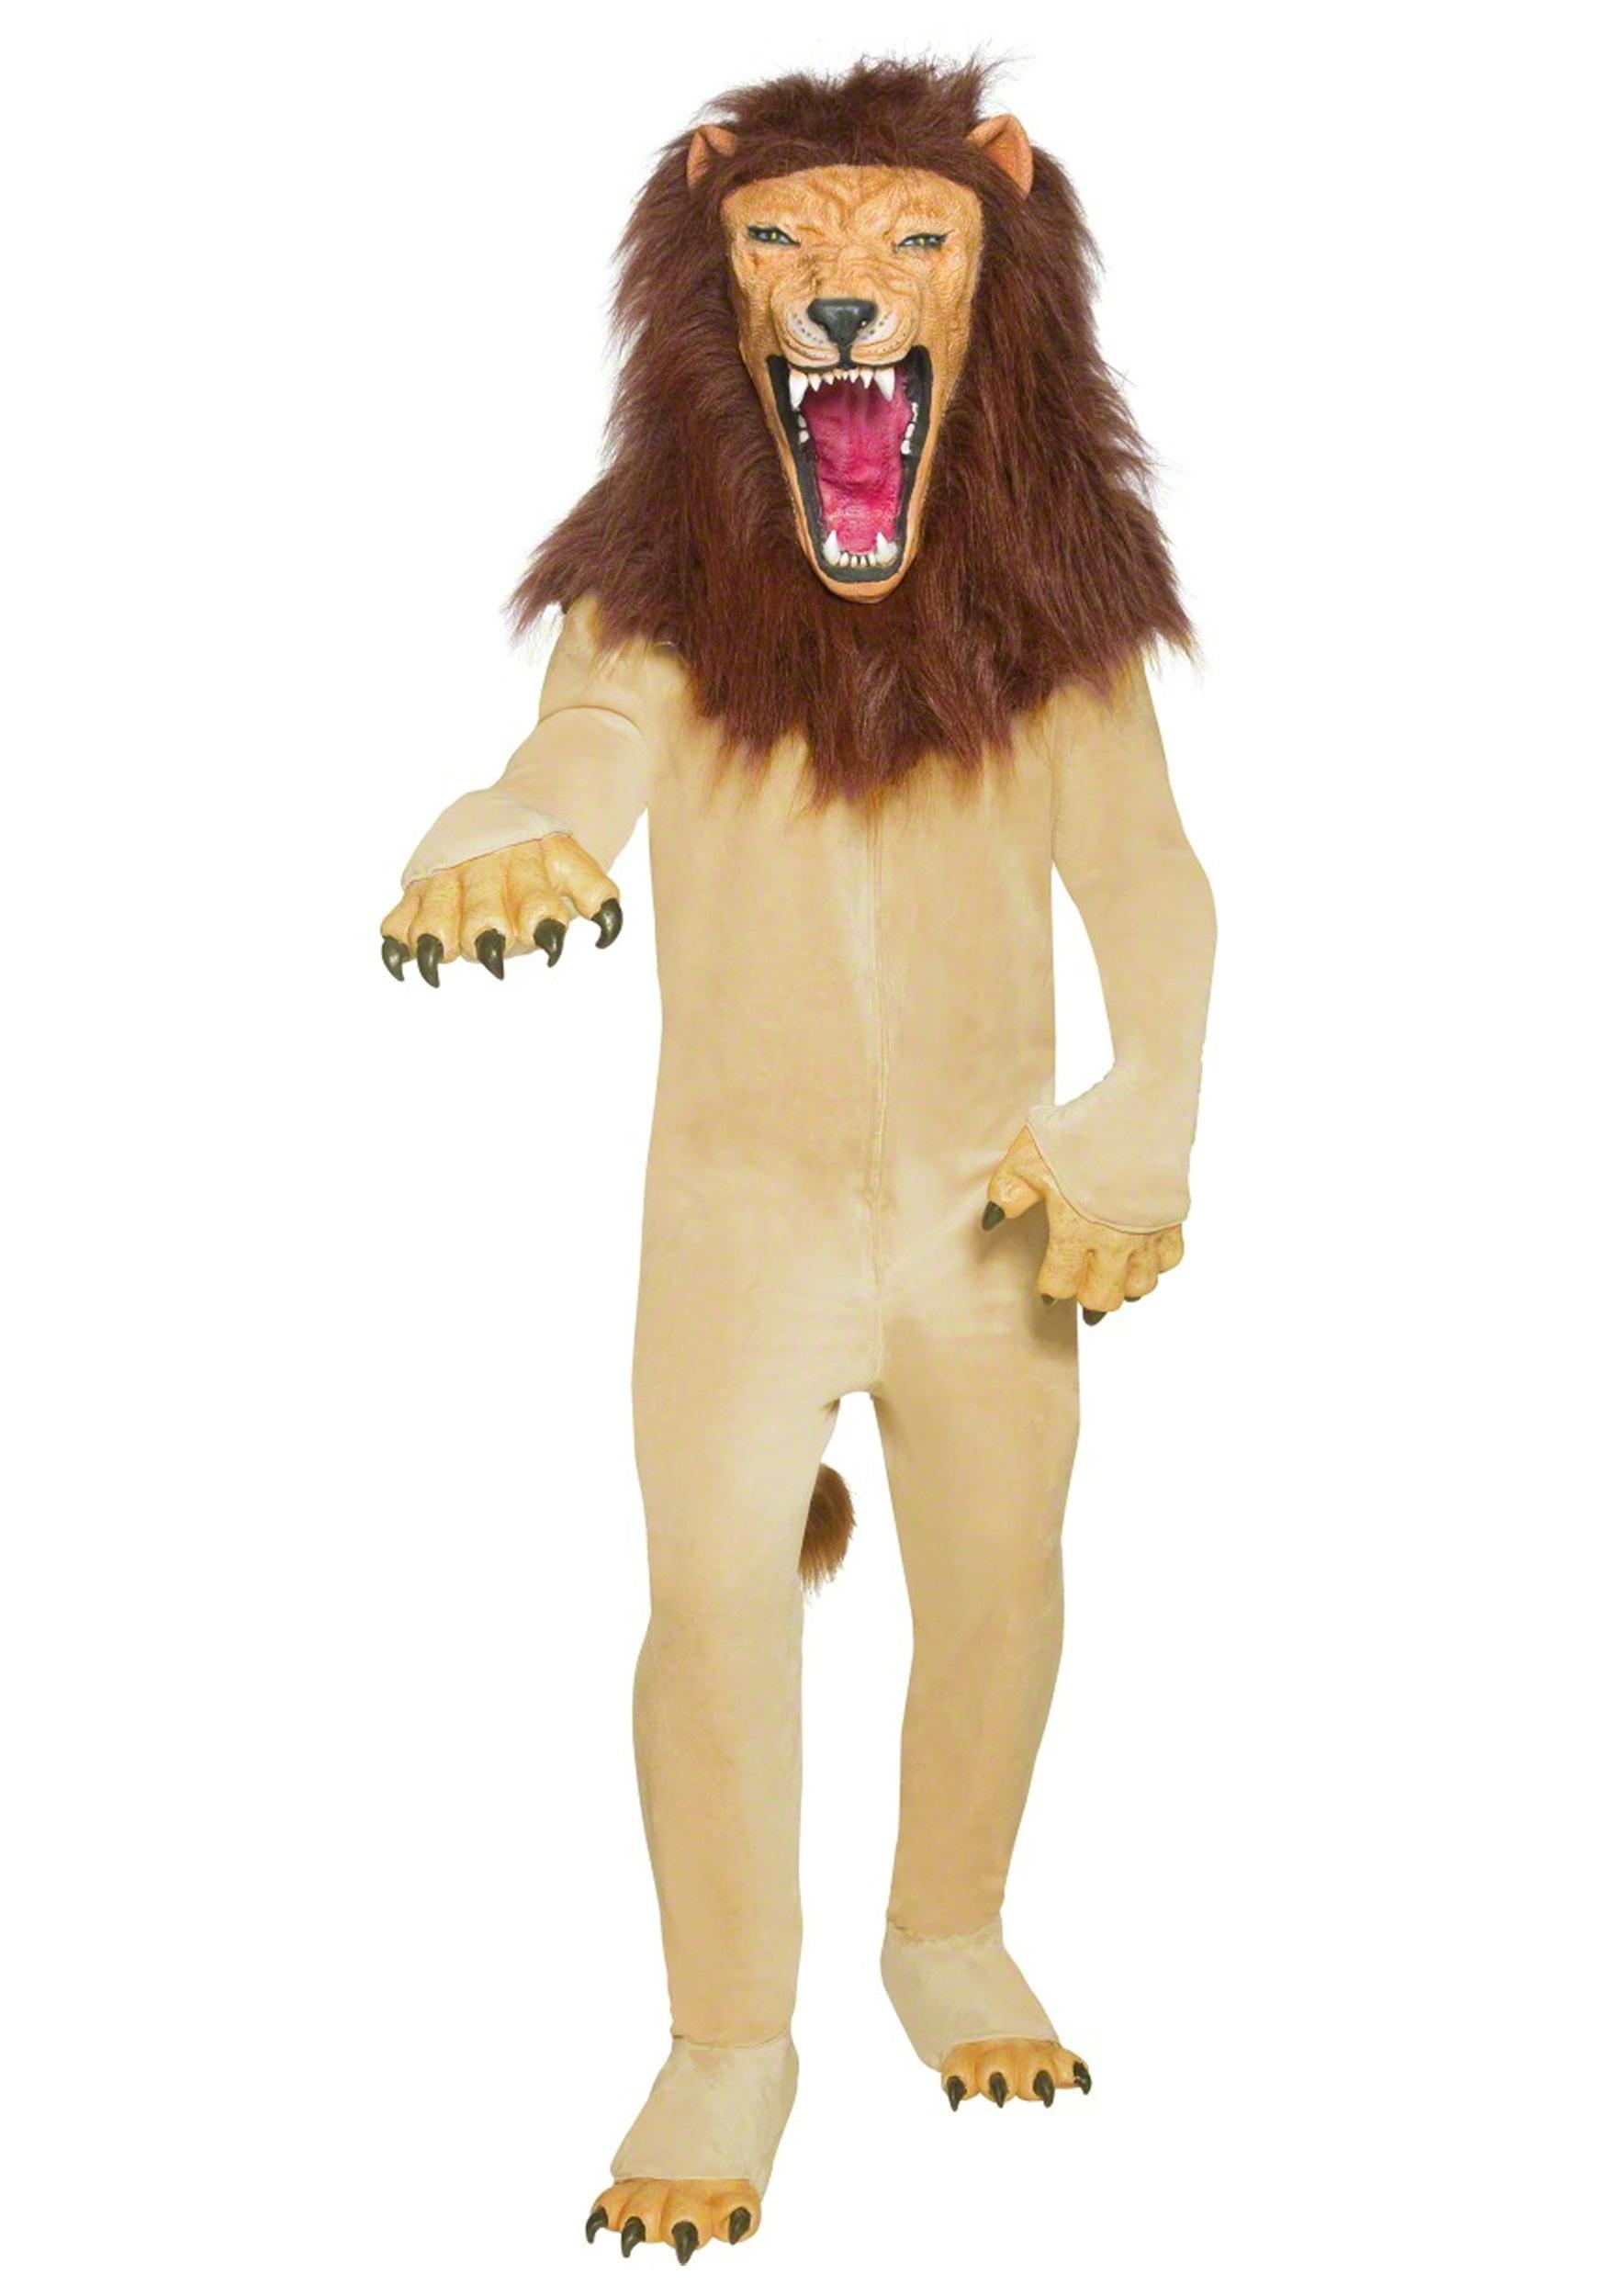 Circus Lion Costume  sc 1 st  Halloween Costumes & Circus Lion Costume - Halloween Costumes